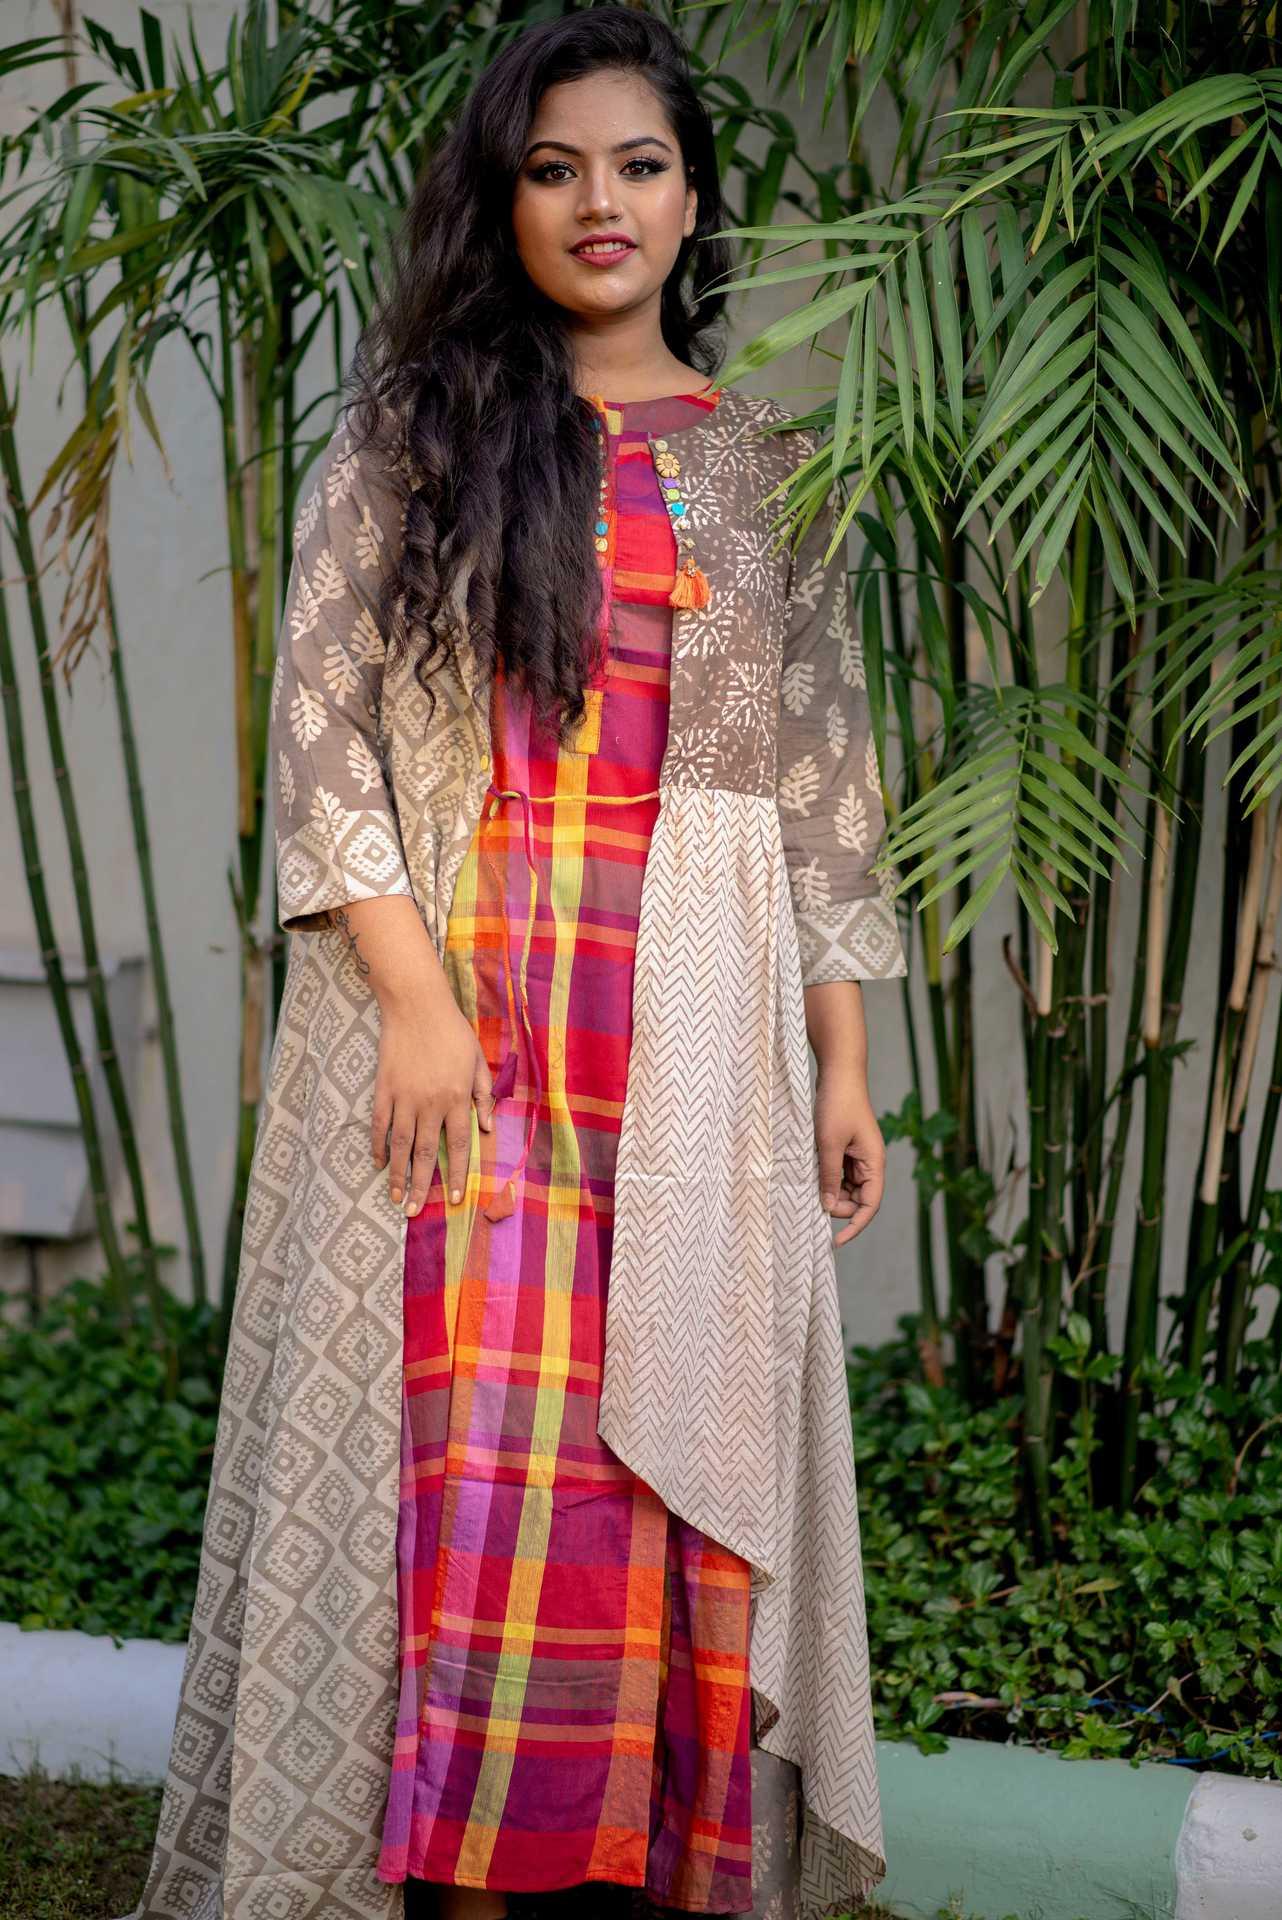 The Fashion Curve by Madhurima - _DSC9284